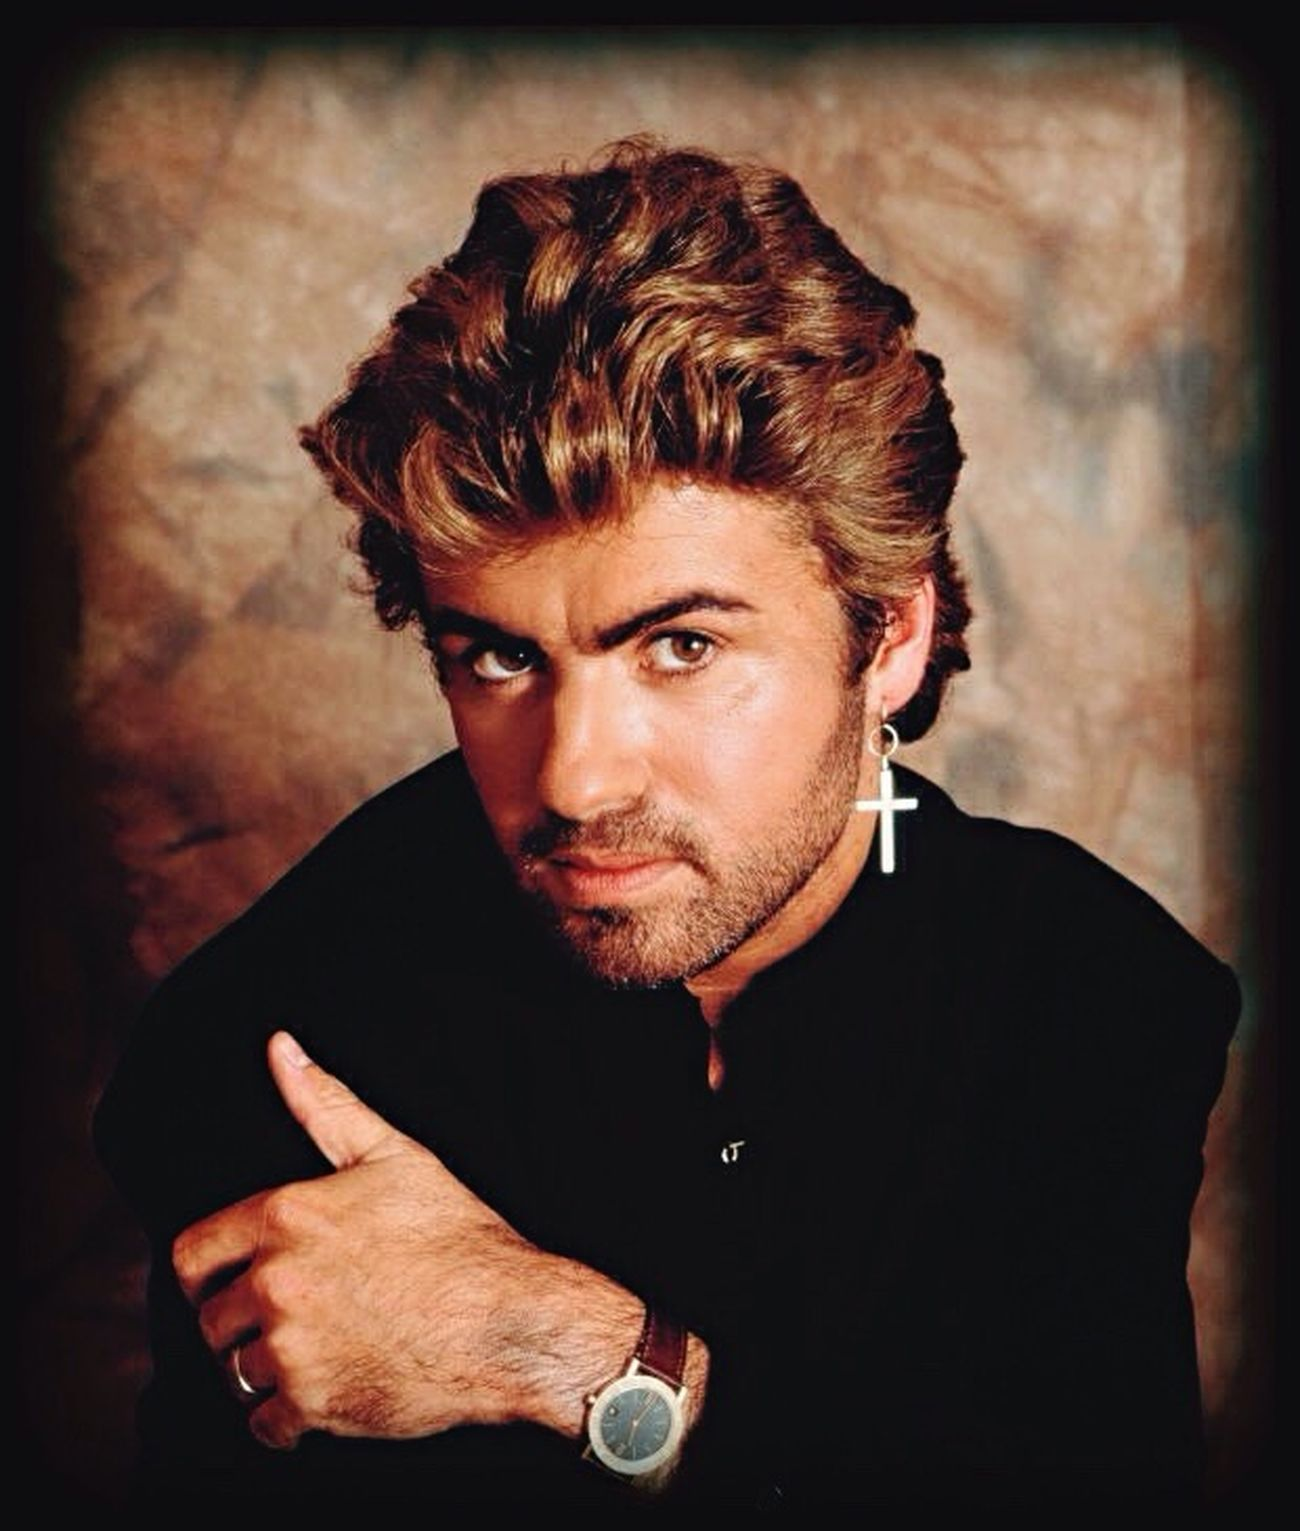 George Michael 💔 George Michael WHAM! Last Christmas 🎄 Rip George ✞